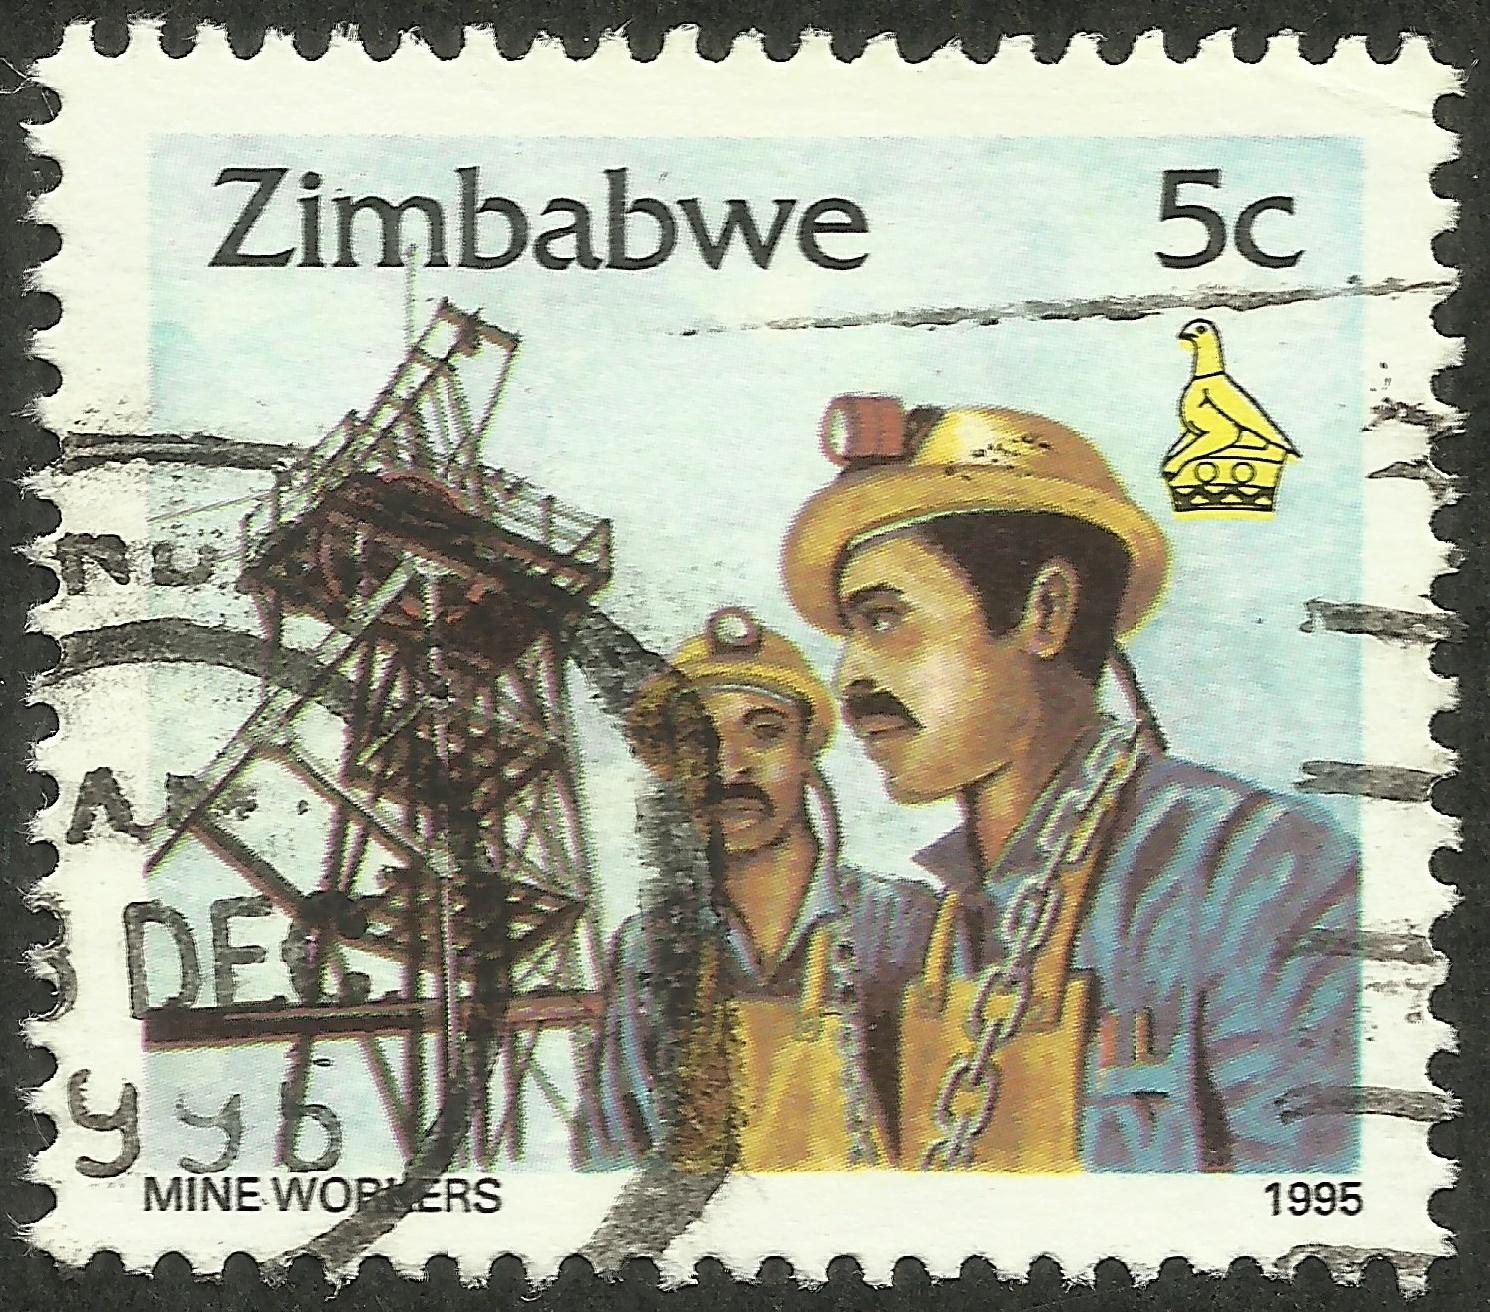 Zimbabwe - Scott #734 (1995)